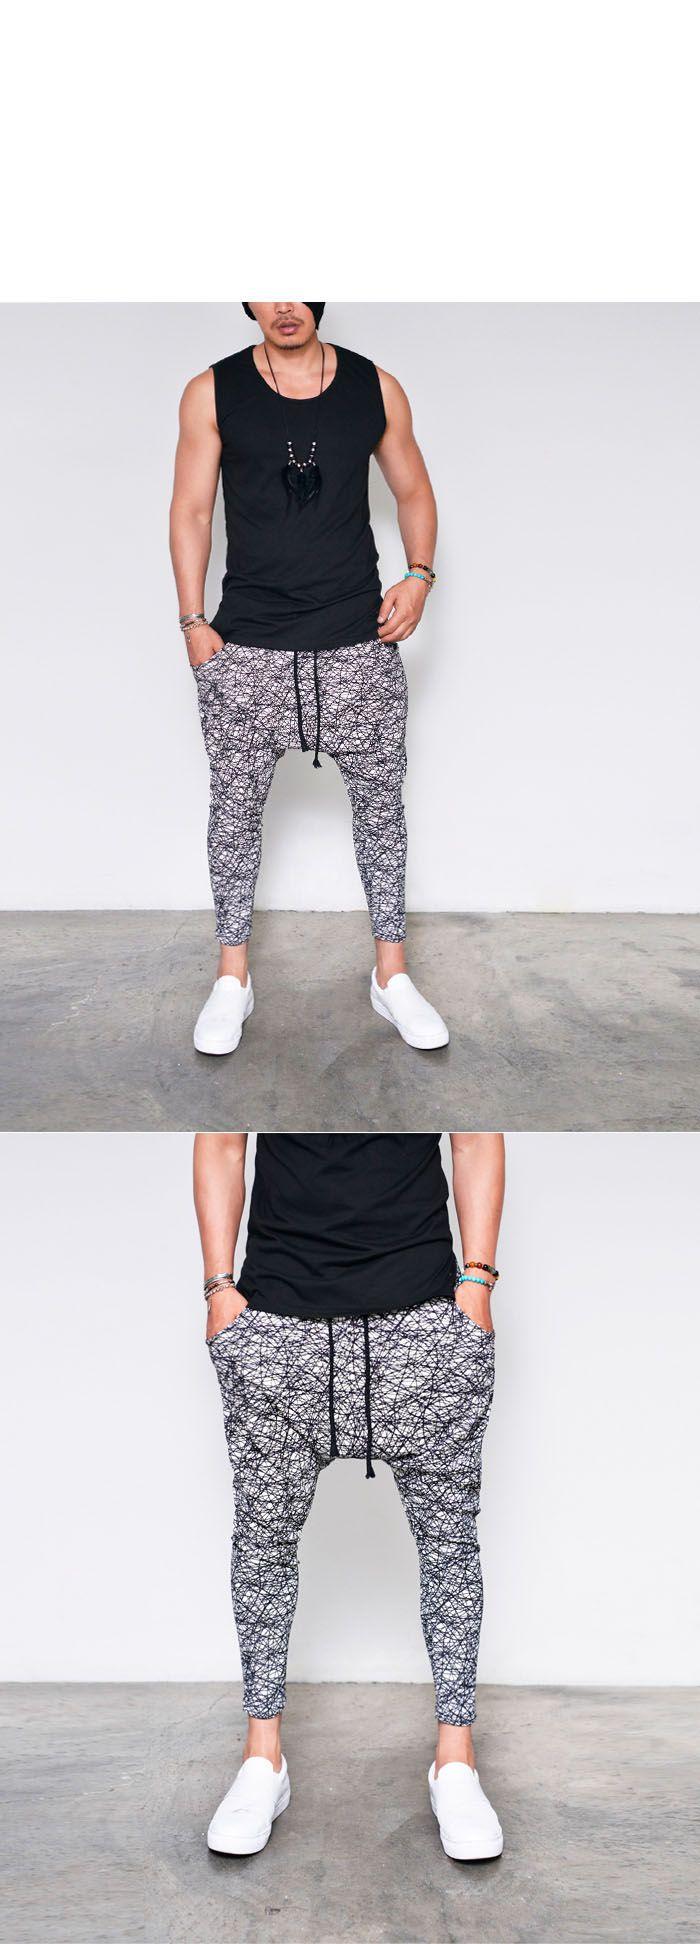 Doodle Print Cropped Drop Baggy-Sweatpants 301 by Guylook.com   #menswear #guylook #guylooks #menspants #pants #linen #summer #ootd #style #mensfashion #fashion #cool #outfit #sweatpants #남자 #패션 #스타일 #스타일리쉬 #남성쇼핑몰 #남성스타일 #남자스타일 #여름 #남자바지